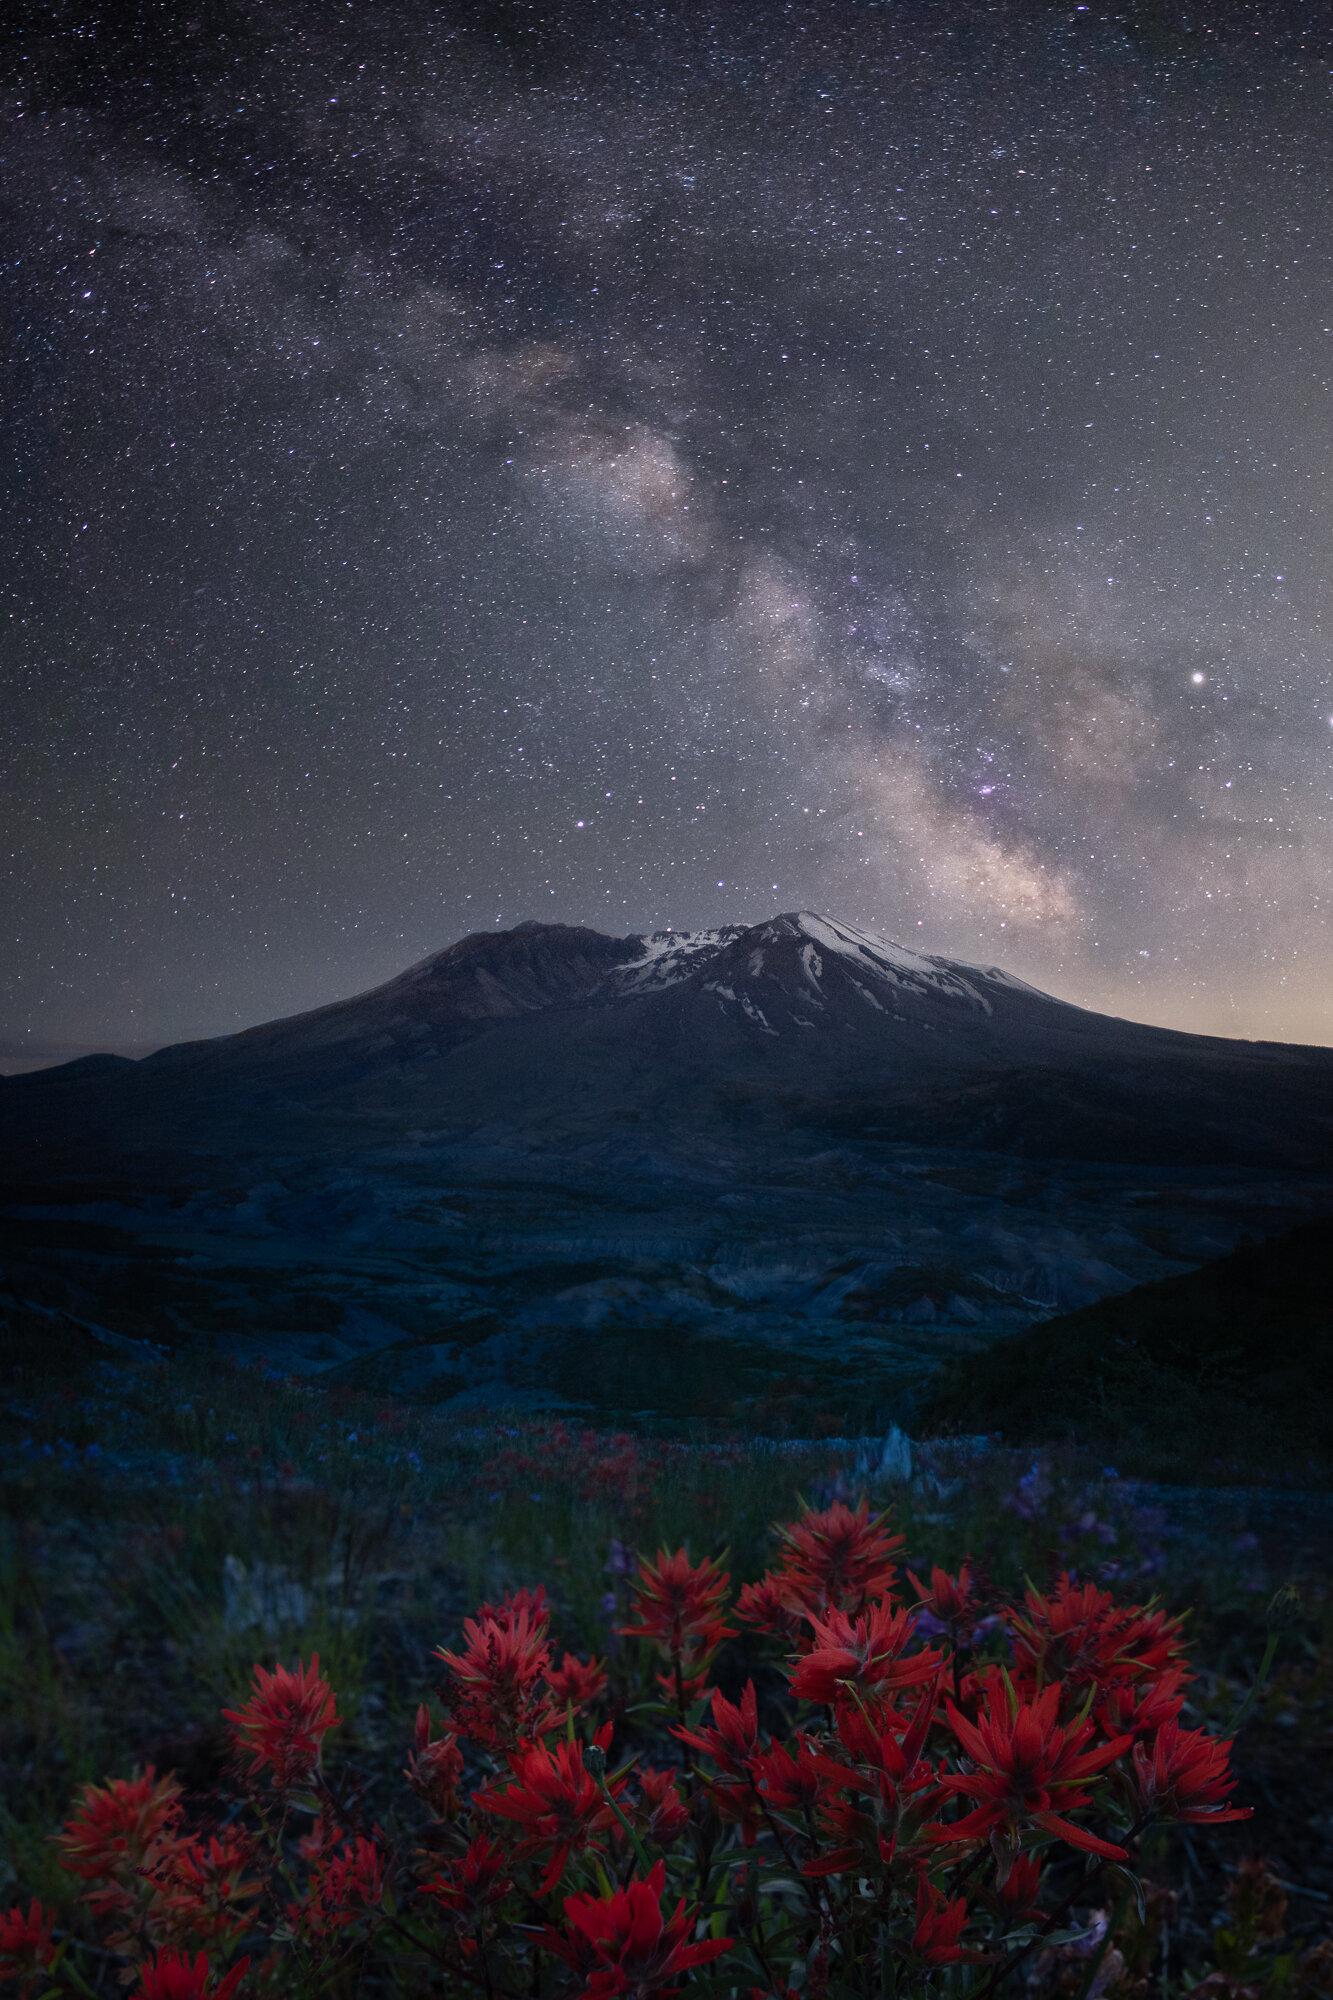 Mount St. Helens Photography: 'Volcanic Eruption'